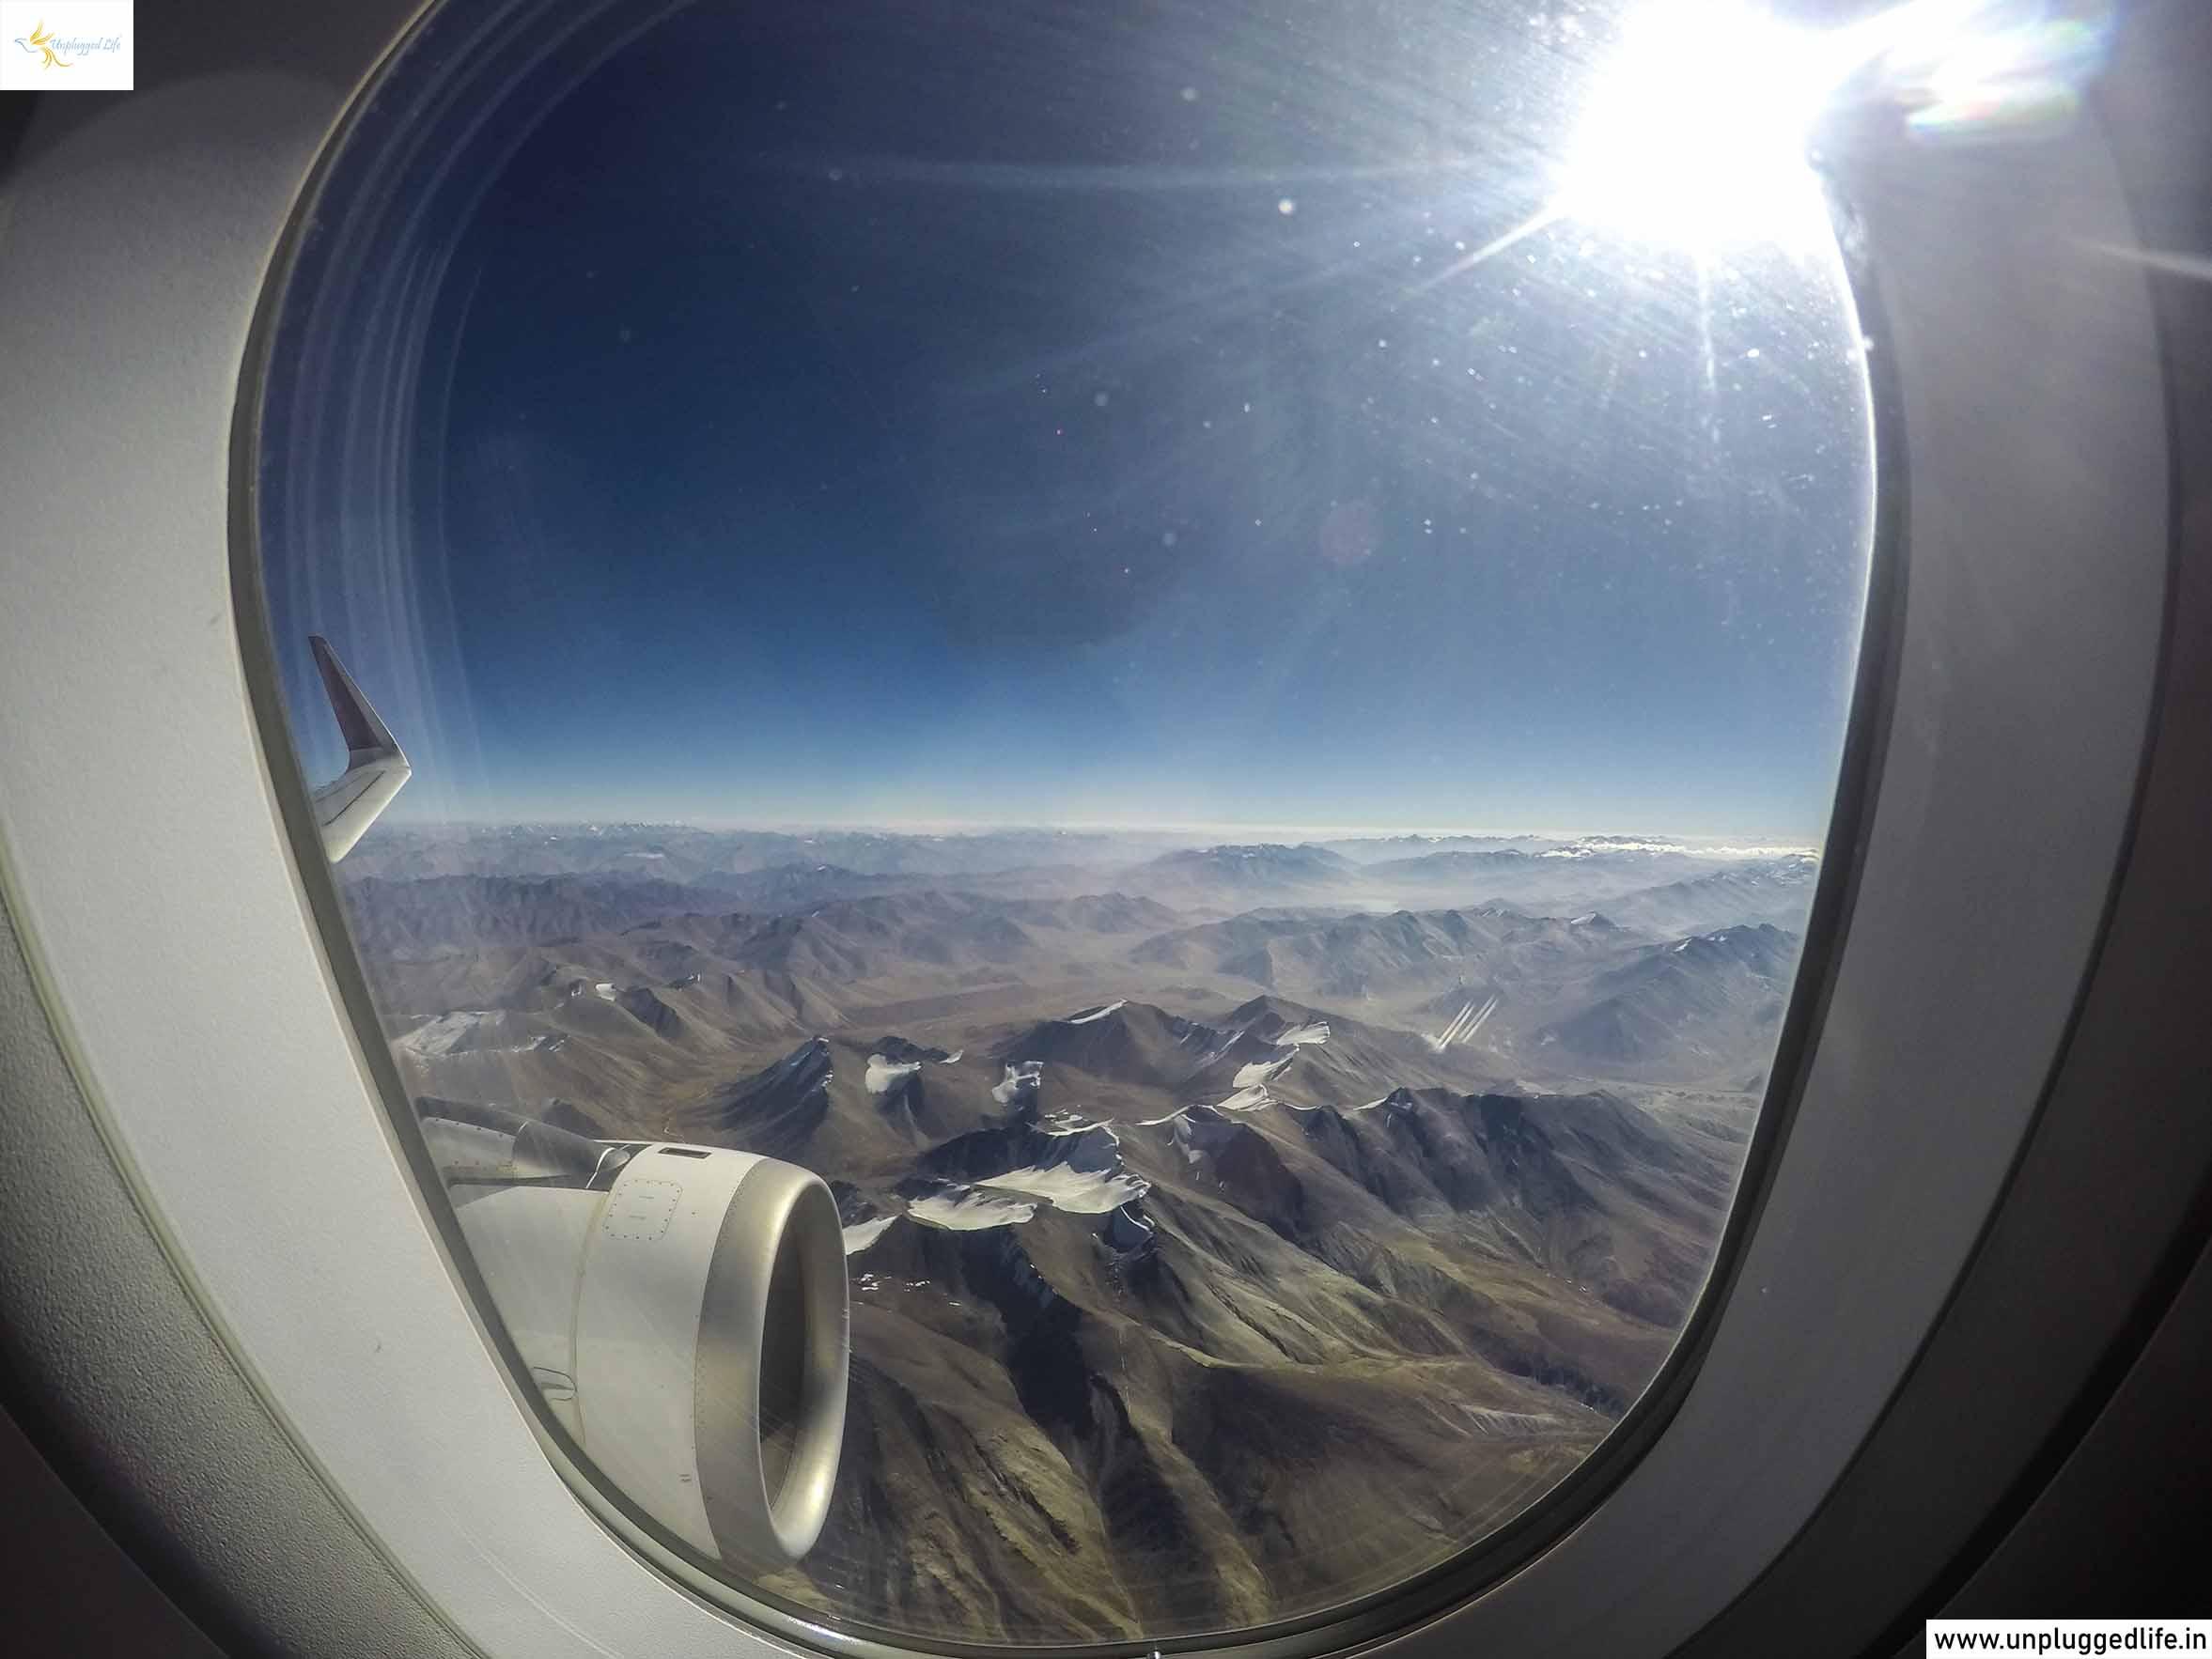 Ladakh, Unplugged Life, Glacier in Ladakh, Ladakh by Air, Ladakh View, Leh Ladakh View, Window View, Flying to Ladakh, Himalayas, Ladakh Mountain, Mountain View, View of Himalaya, Ladakh by Flight, Landscape in Ladakh, Landscape, Mountains